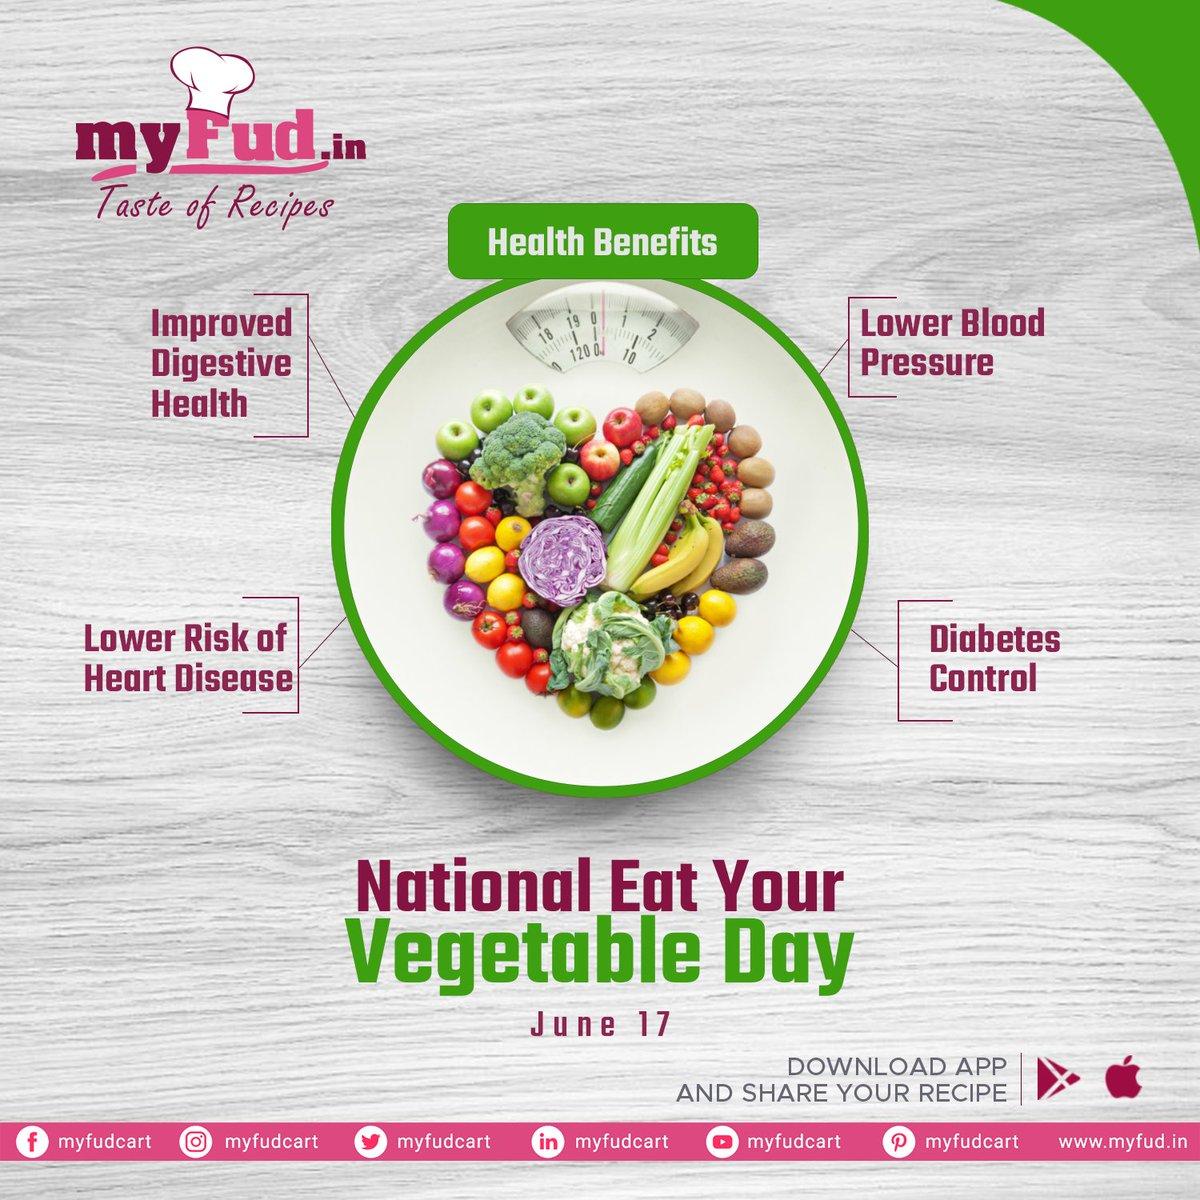 National Eat Your Vegetable Day  #myfudcart #myfud #vegetableday #eatvegetables   #foodies #foodlove #kannur #kerala https://t.co/lbg2m779hp